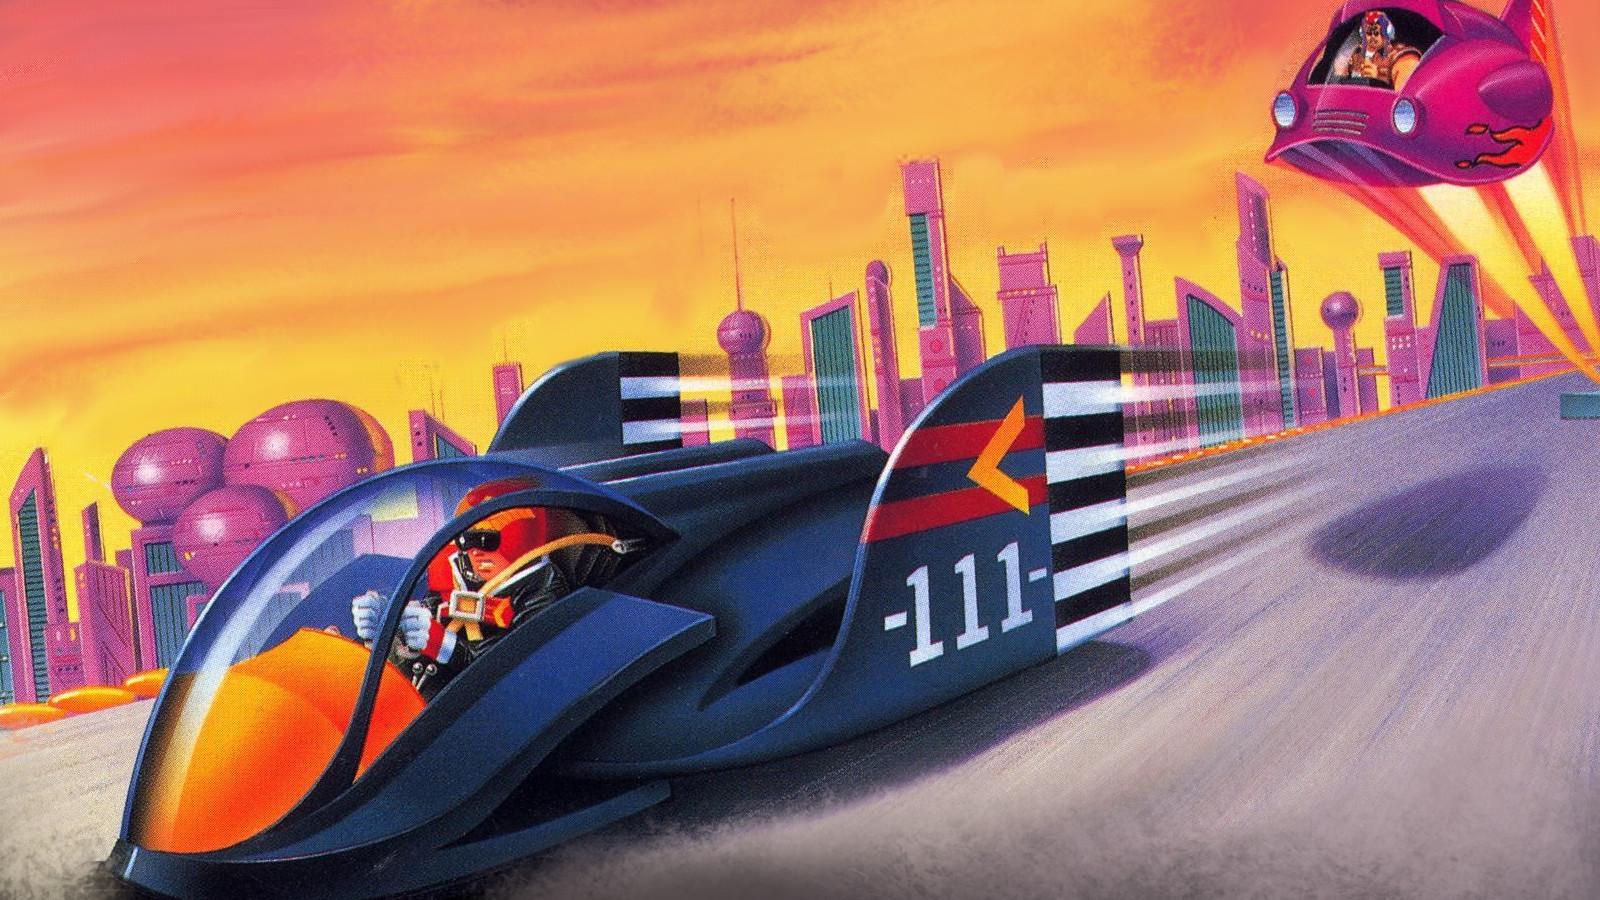 Official art for F-Zero SNES